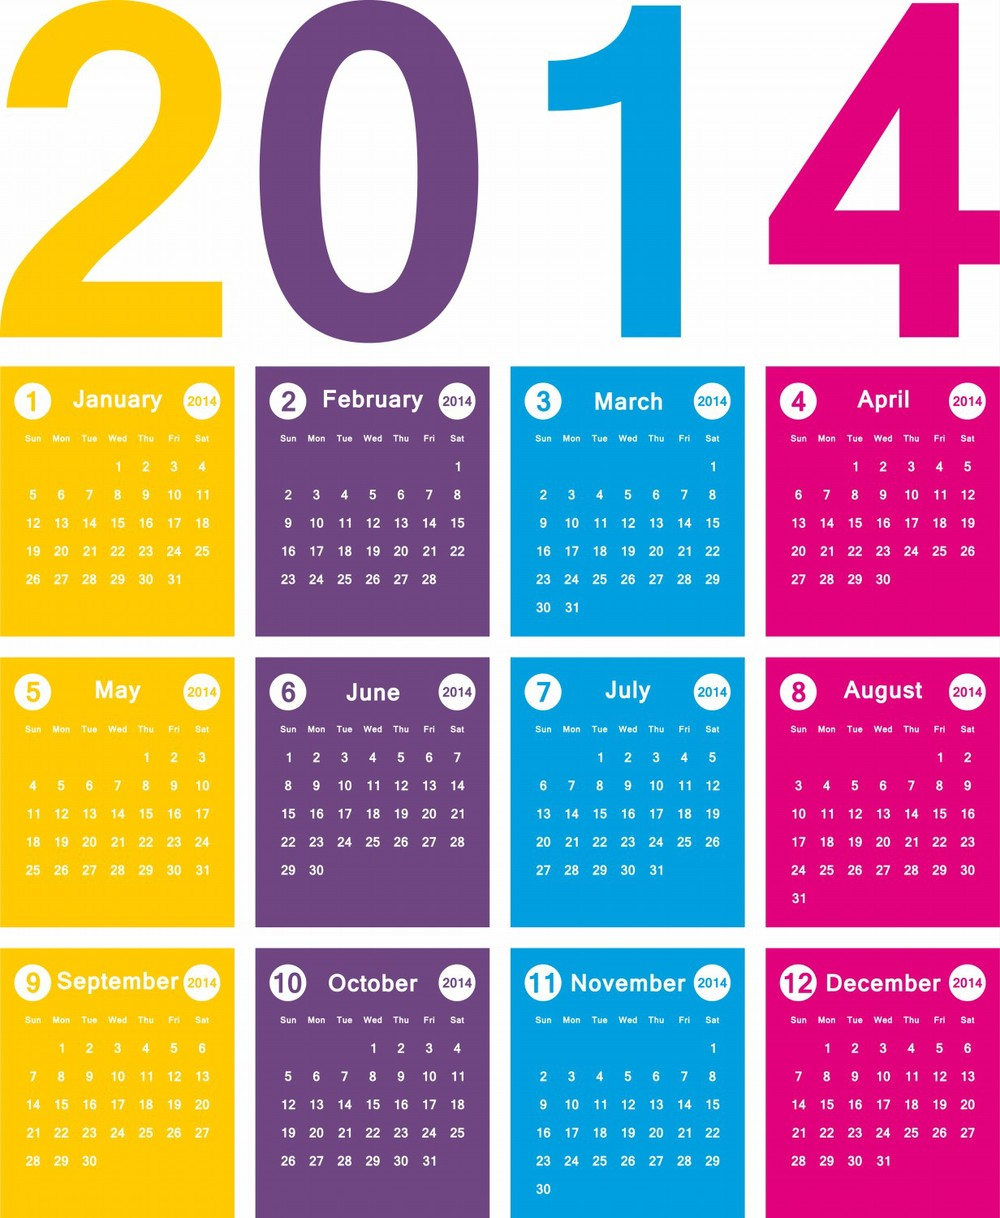 Free-+-New-2014-Calendar-Design-2.jpg